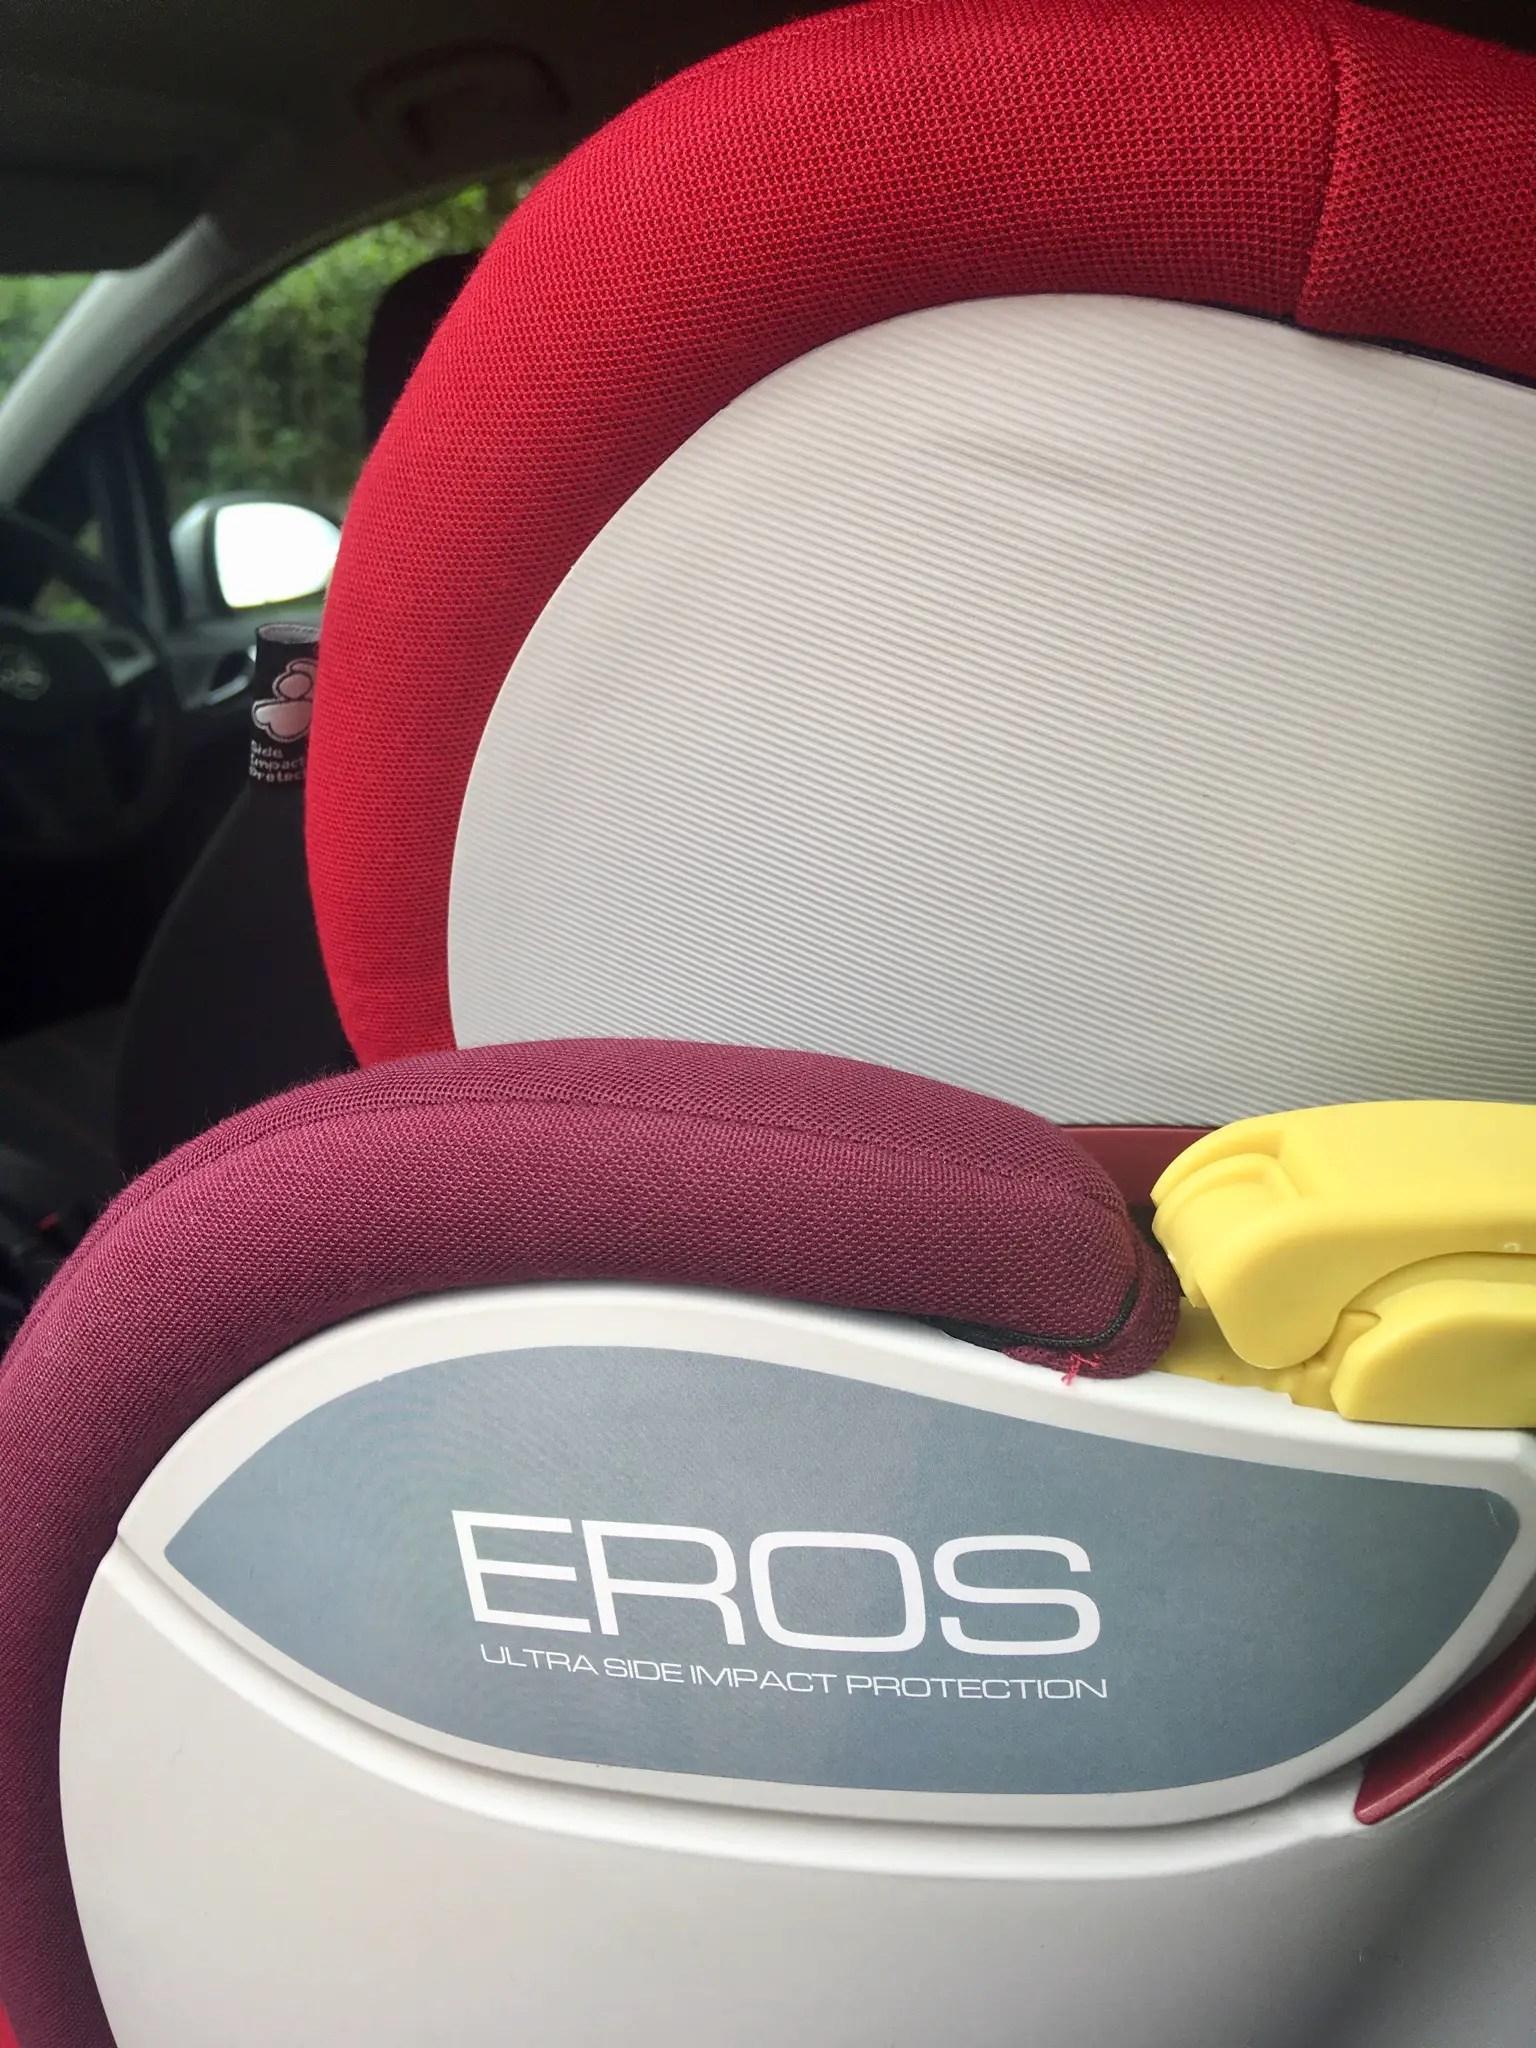 eros seat review